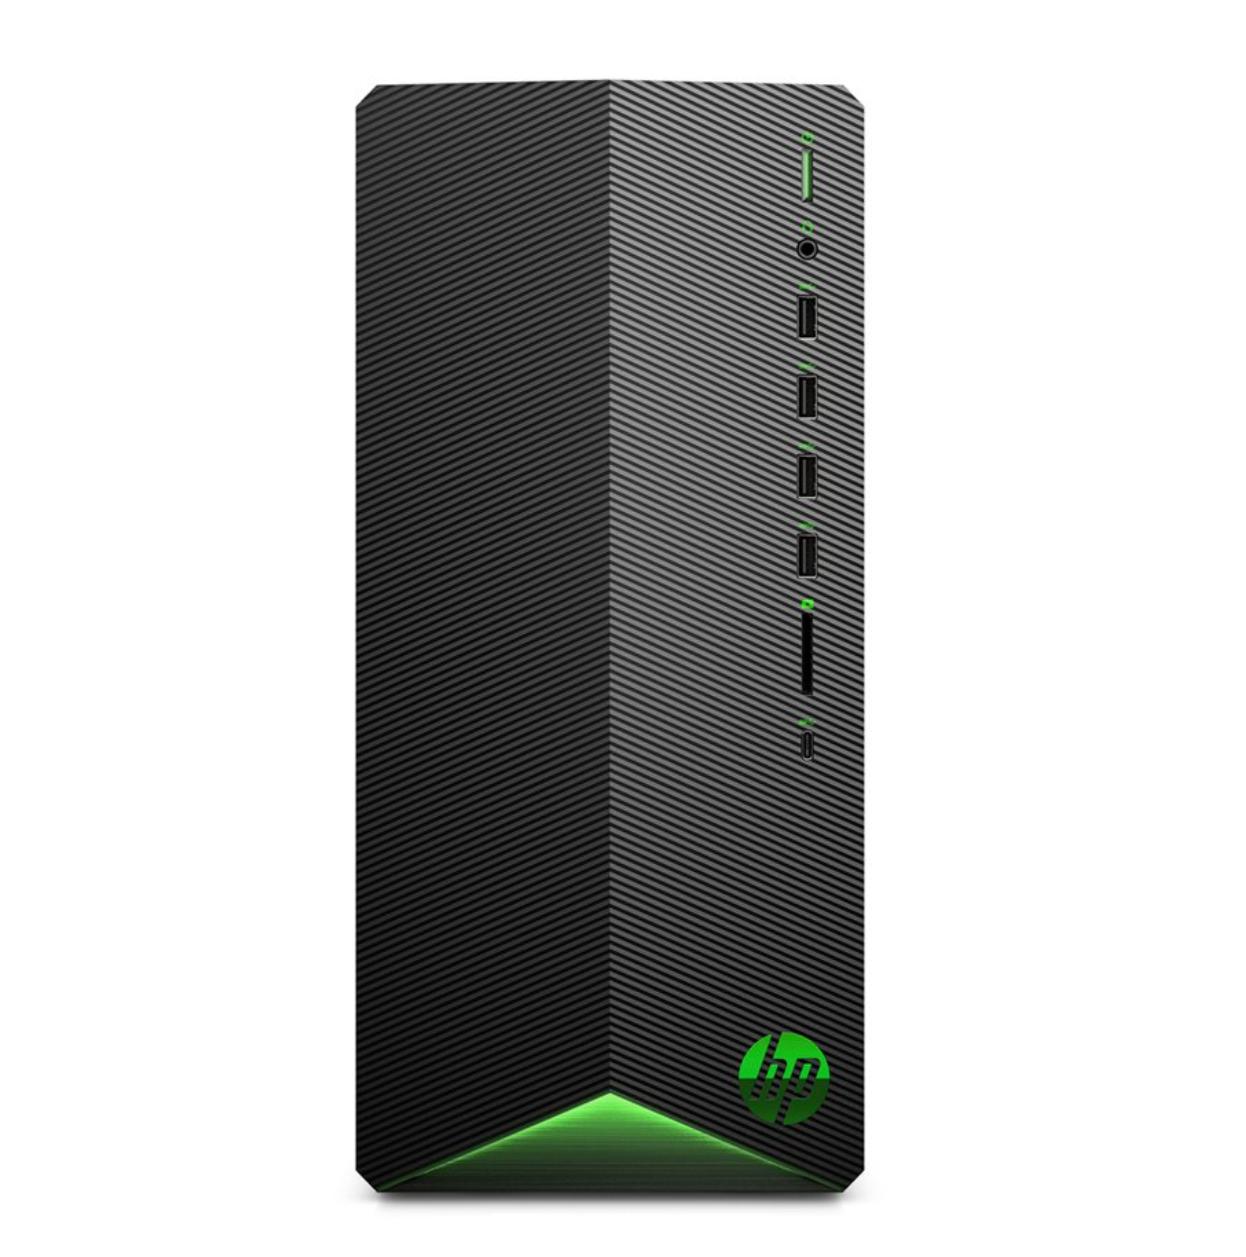 Refurbished HP Pavilion Gaming R5 1650 Super, Ryzen 5 3500, 8GB DDR4, M.2 256GB SSD Gaming Desktop